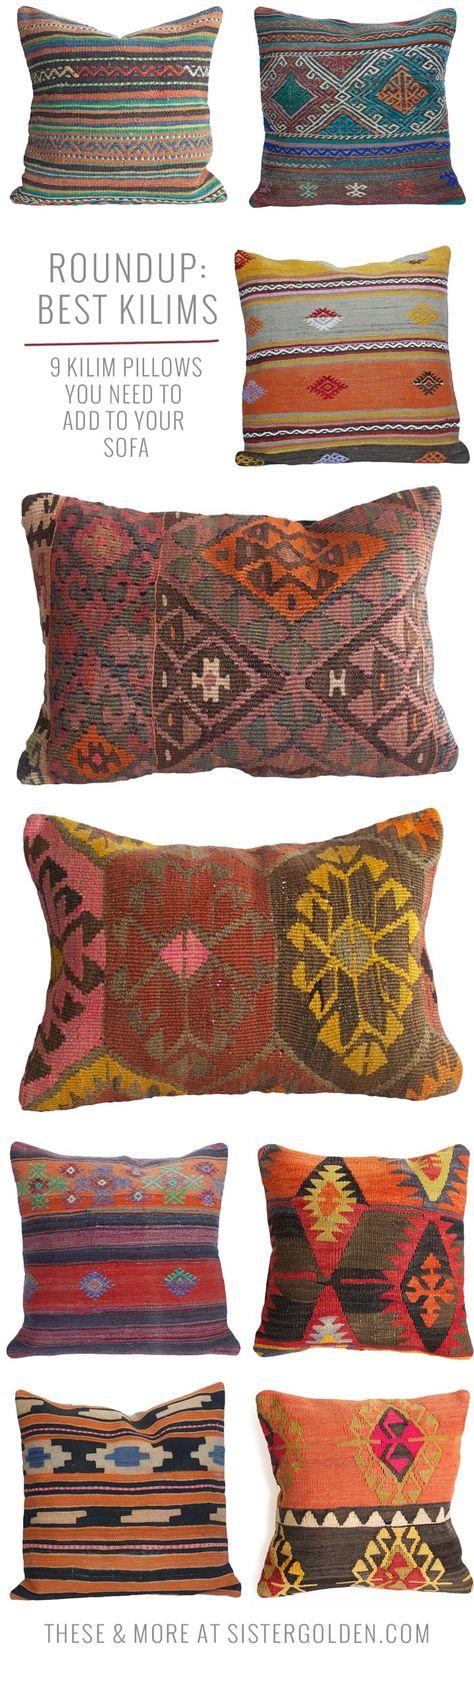 500 My Pillows Ideas Pillows Throw Pillows Decorative Pillows